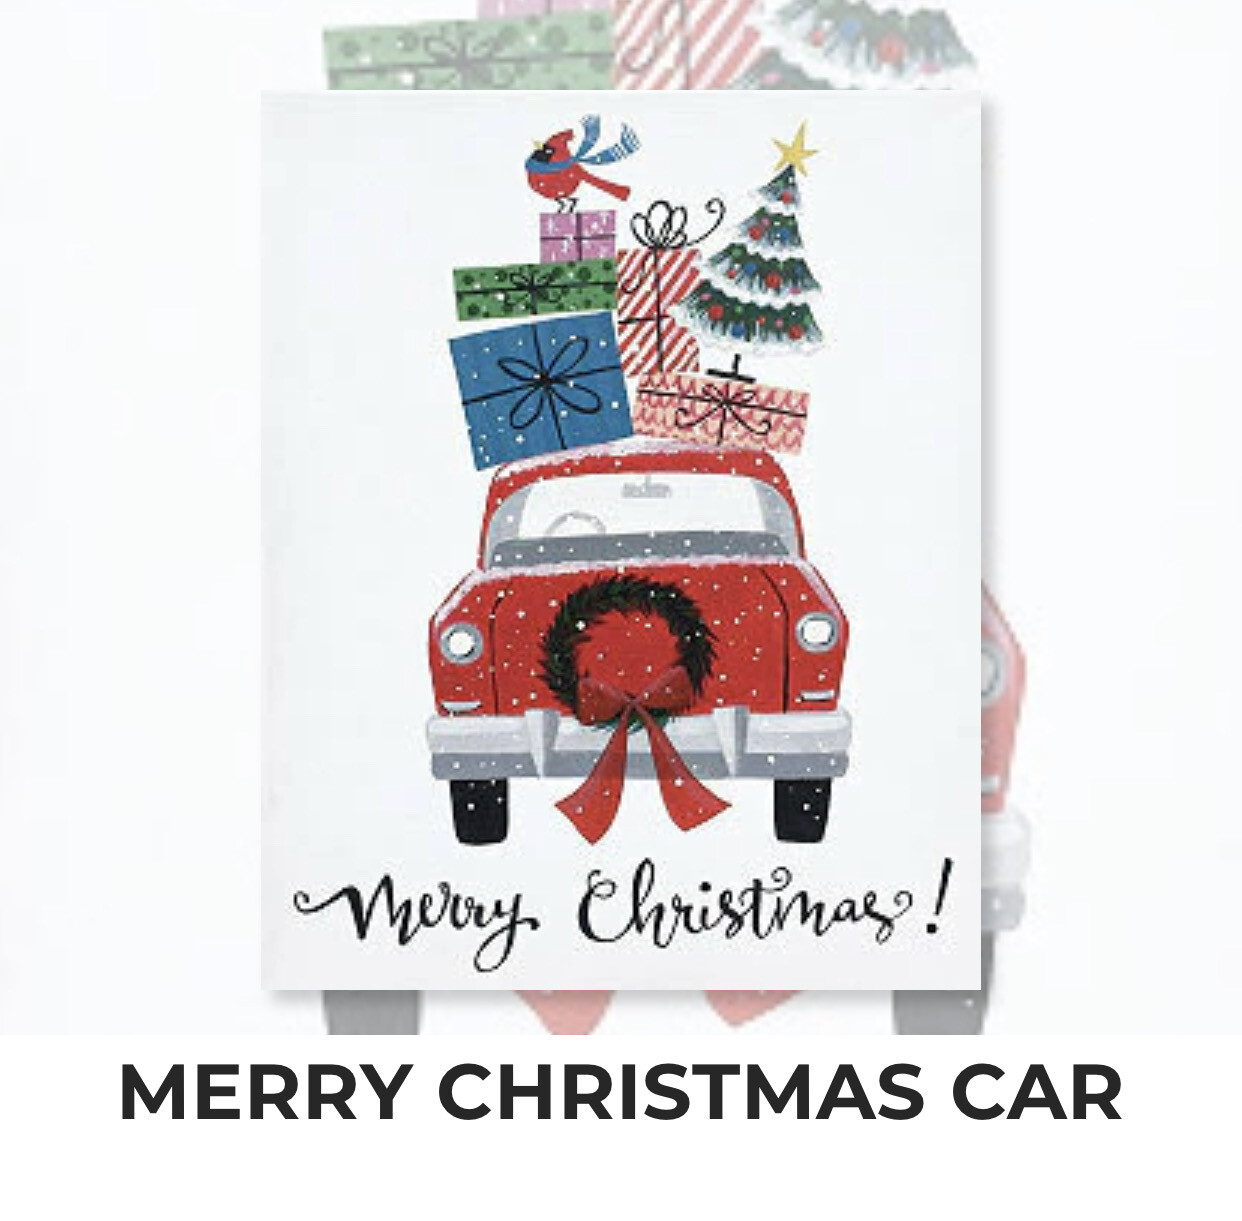 Merry Christmas Car ADULT Acrylic Paint On Canvas DIY Art Kit - 3 Week Special Order